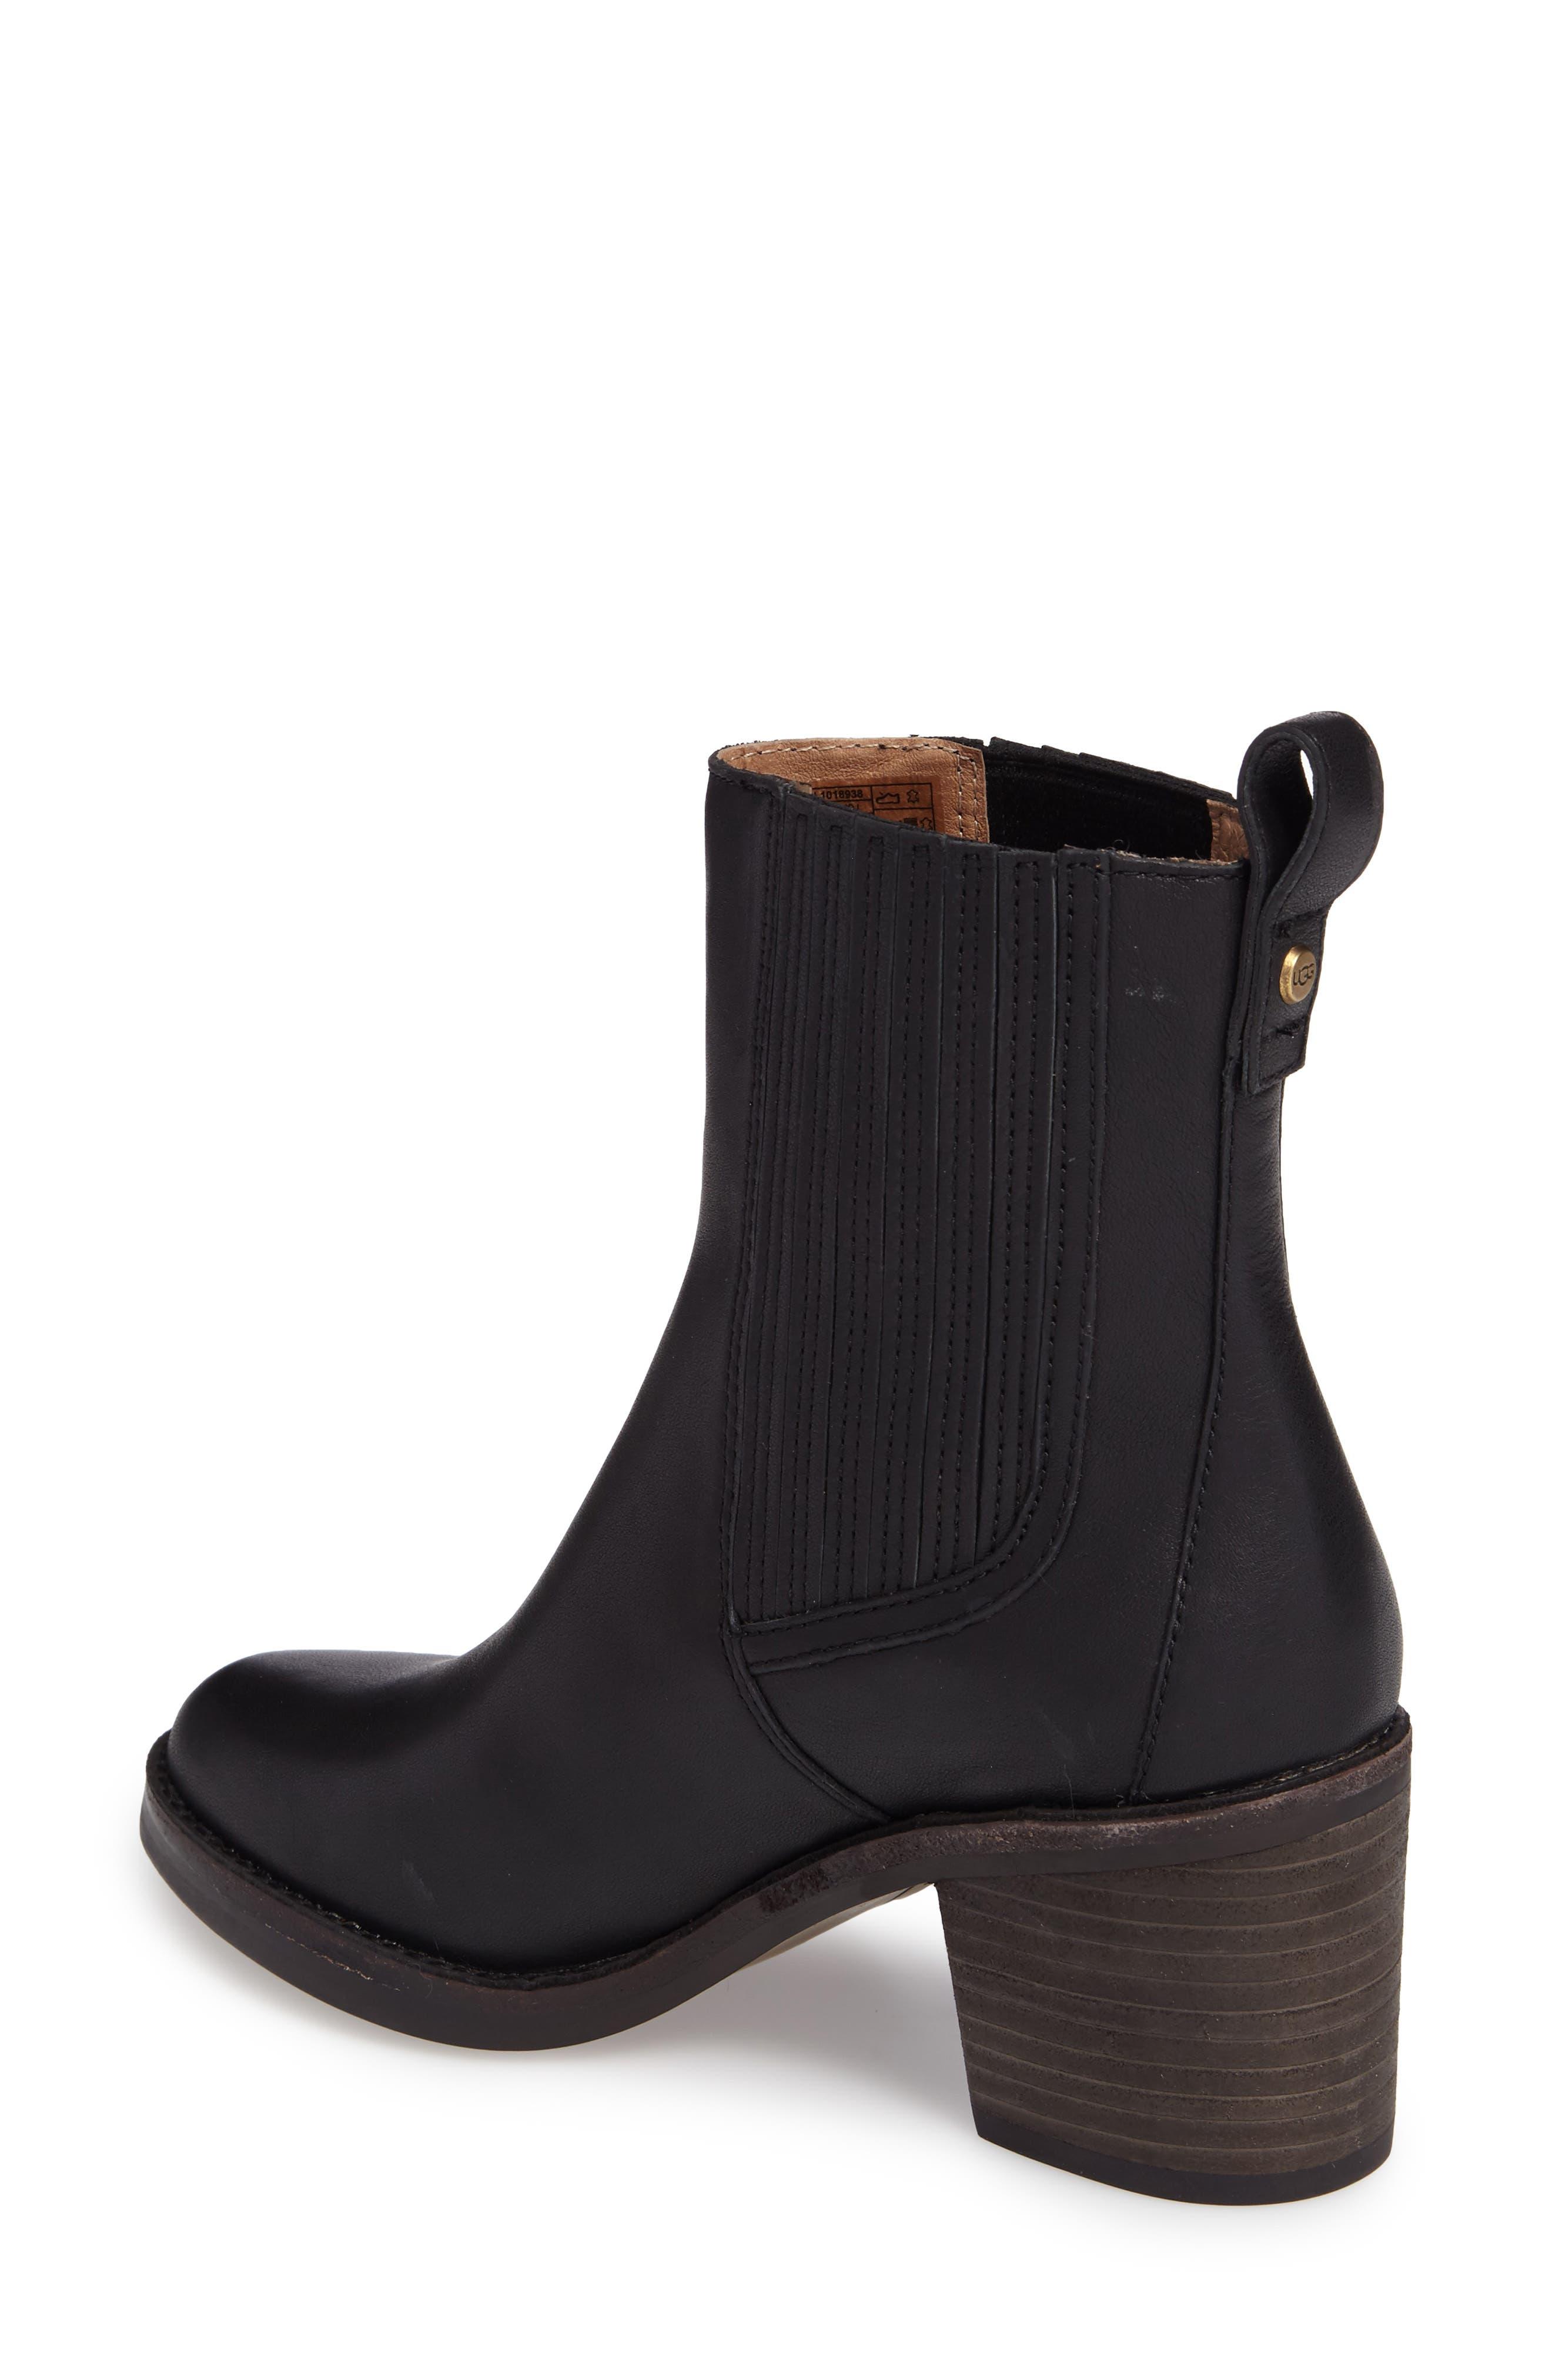 Camden Chelsea Boot,                             Alternate thumbnail 2, color,                             Black Leather